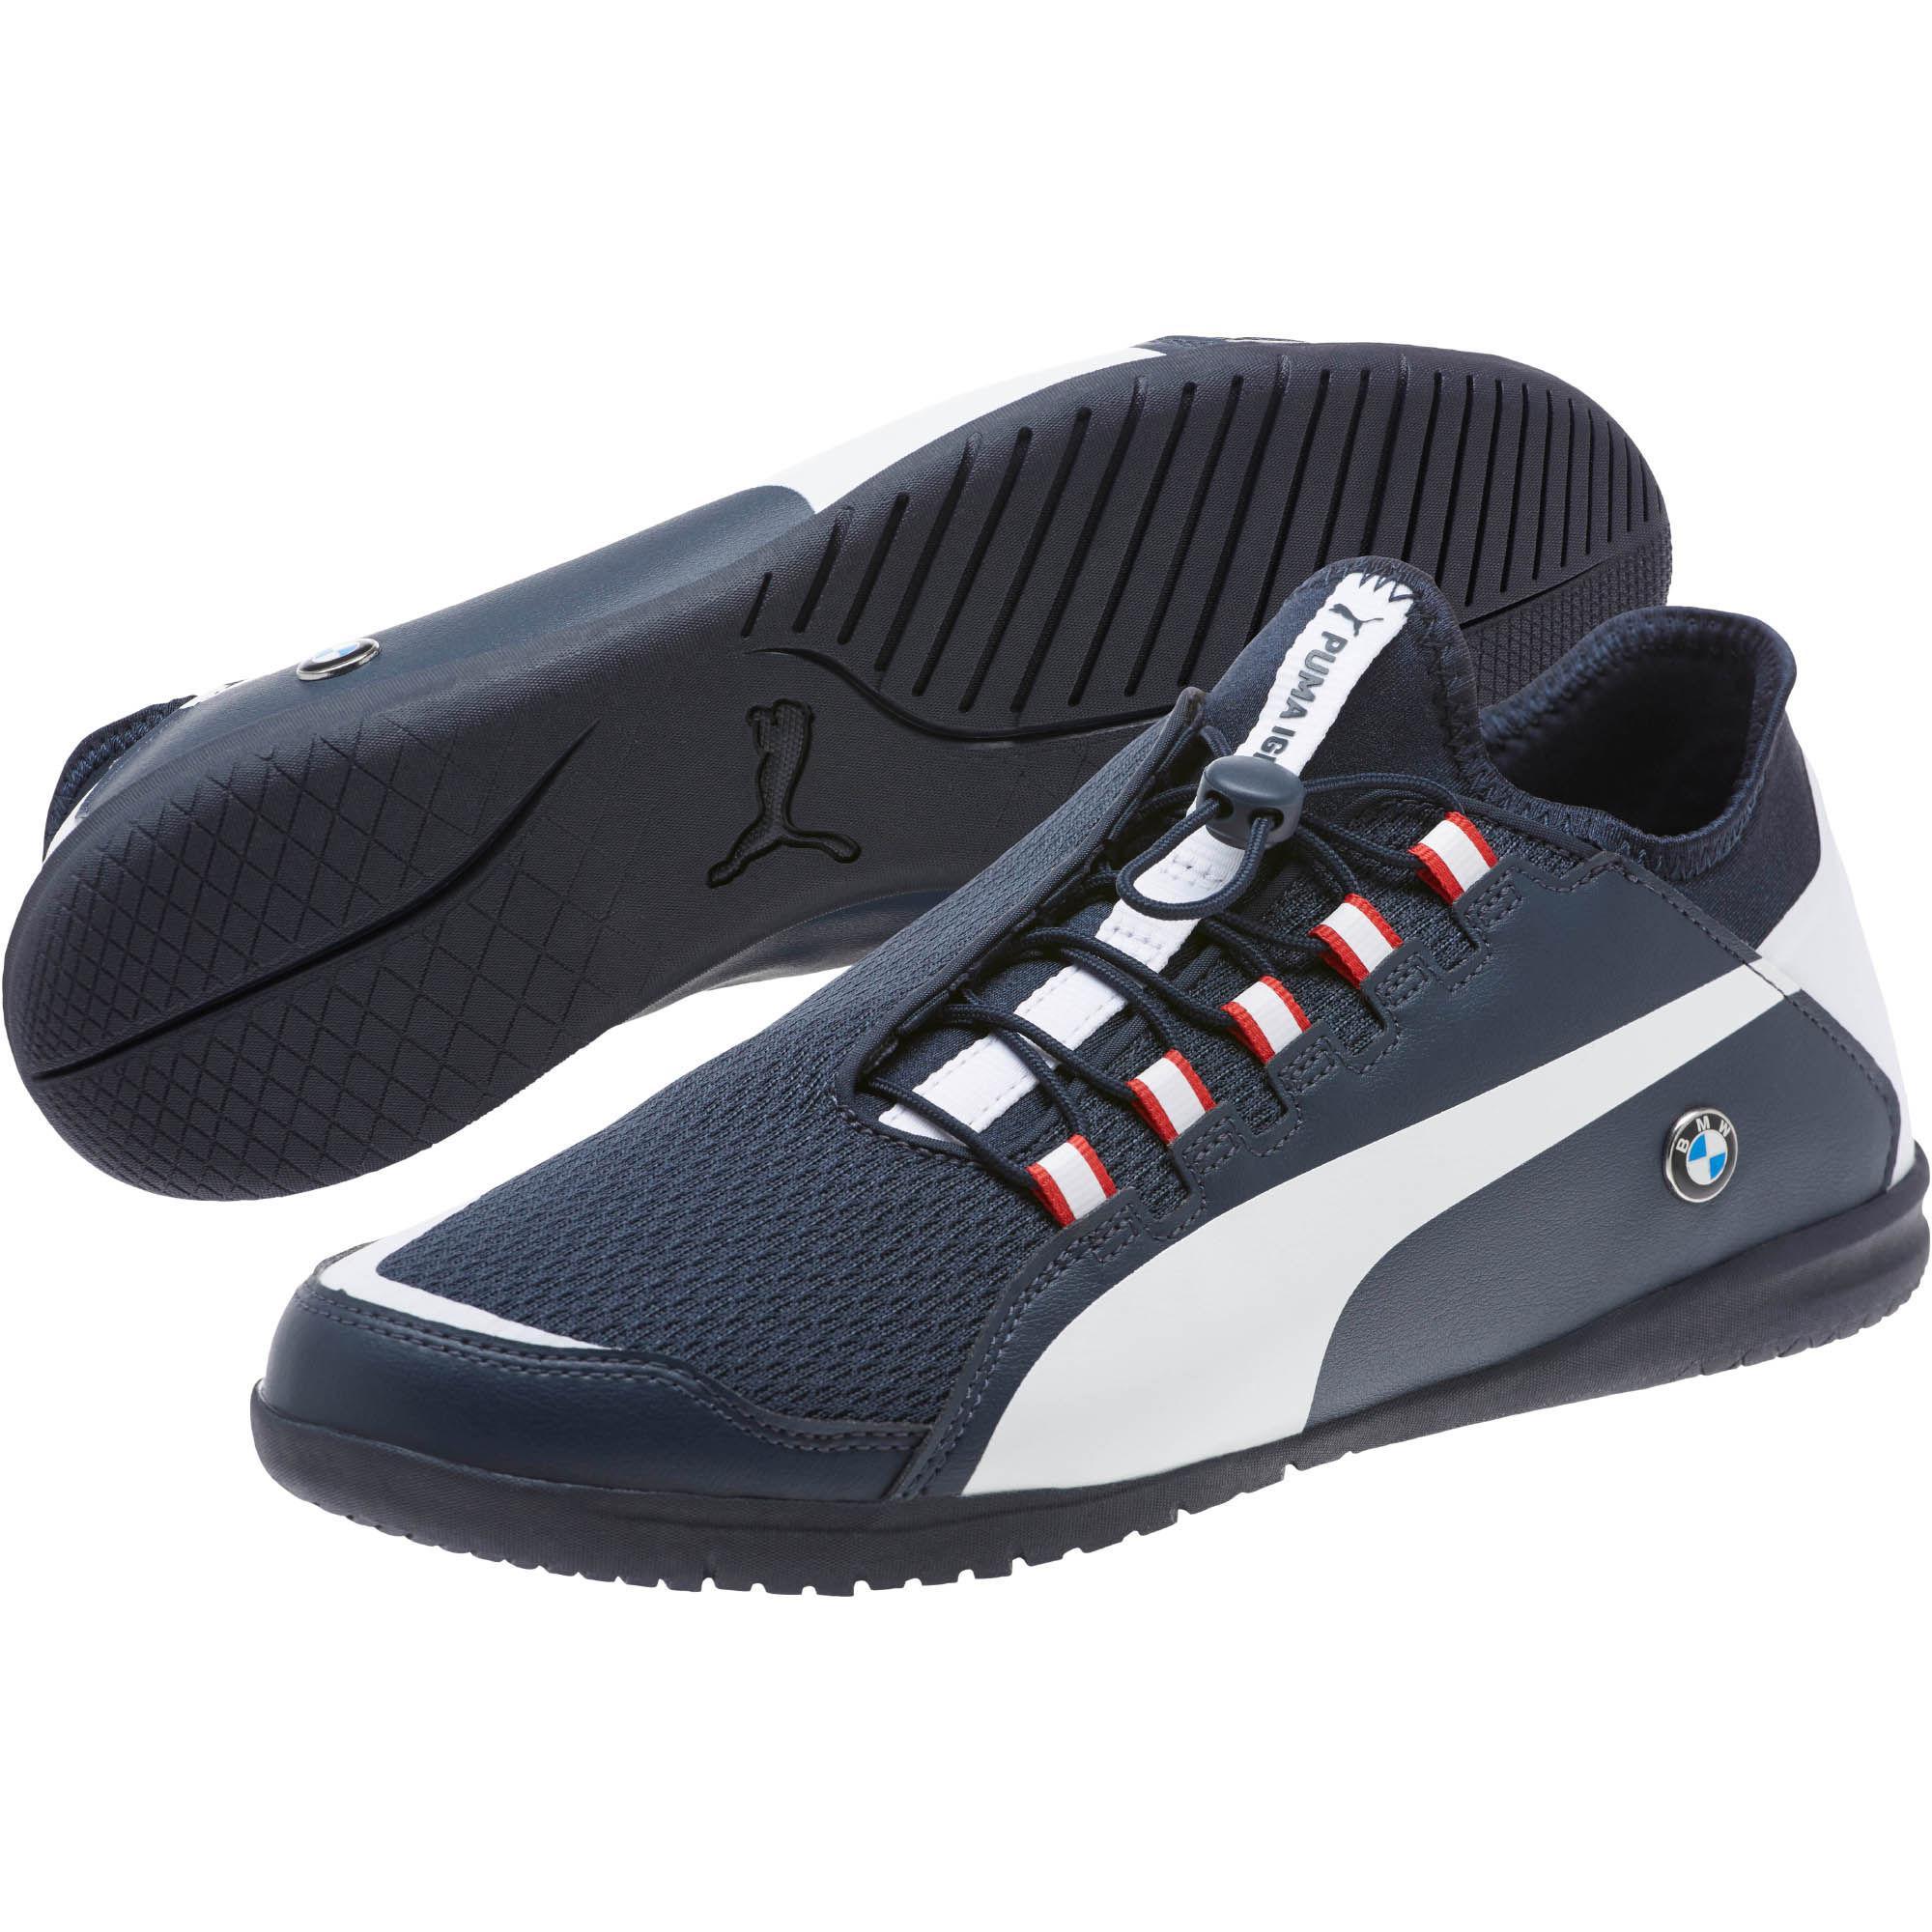 Lyst - PUMA Bmw Motorsport F Cat Ignite Men s Sneakers in Blue for Men 0c6f01e23